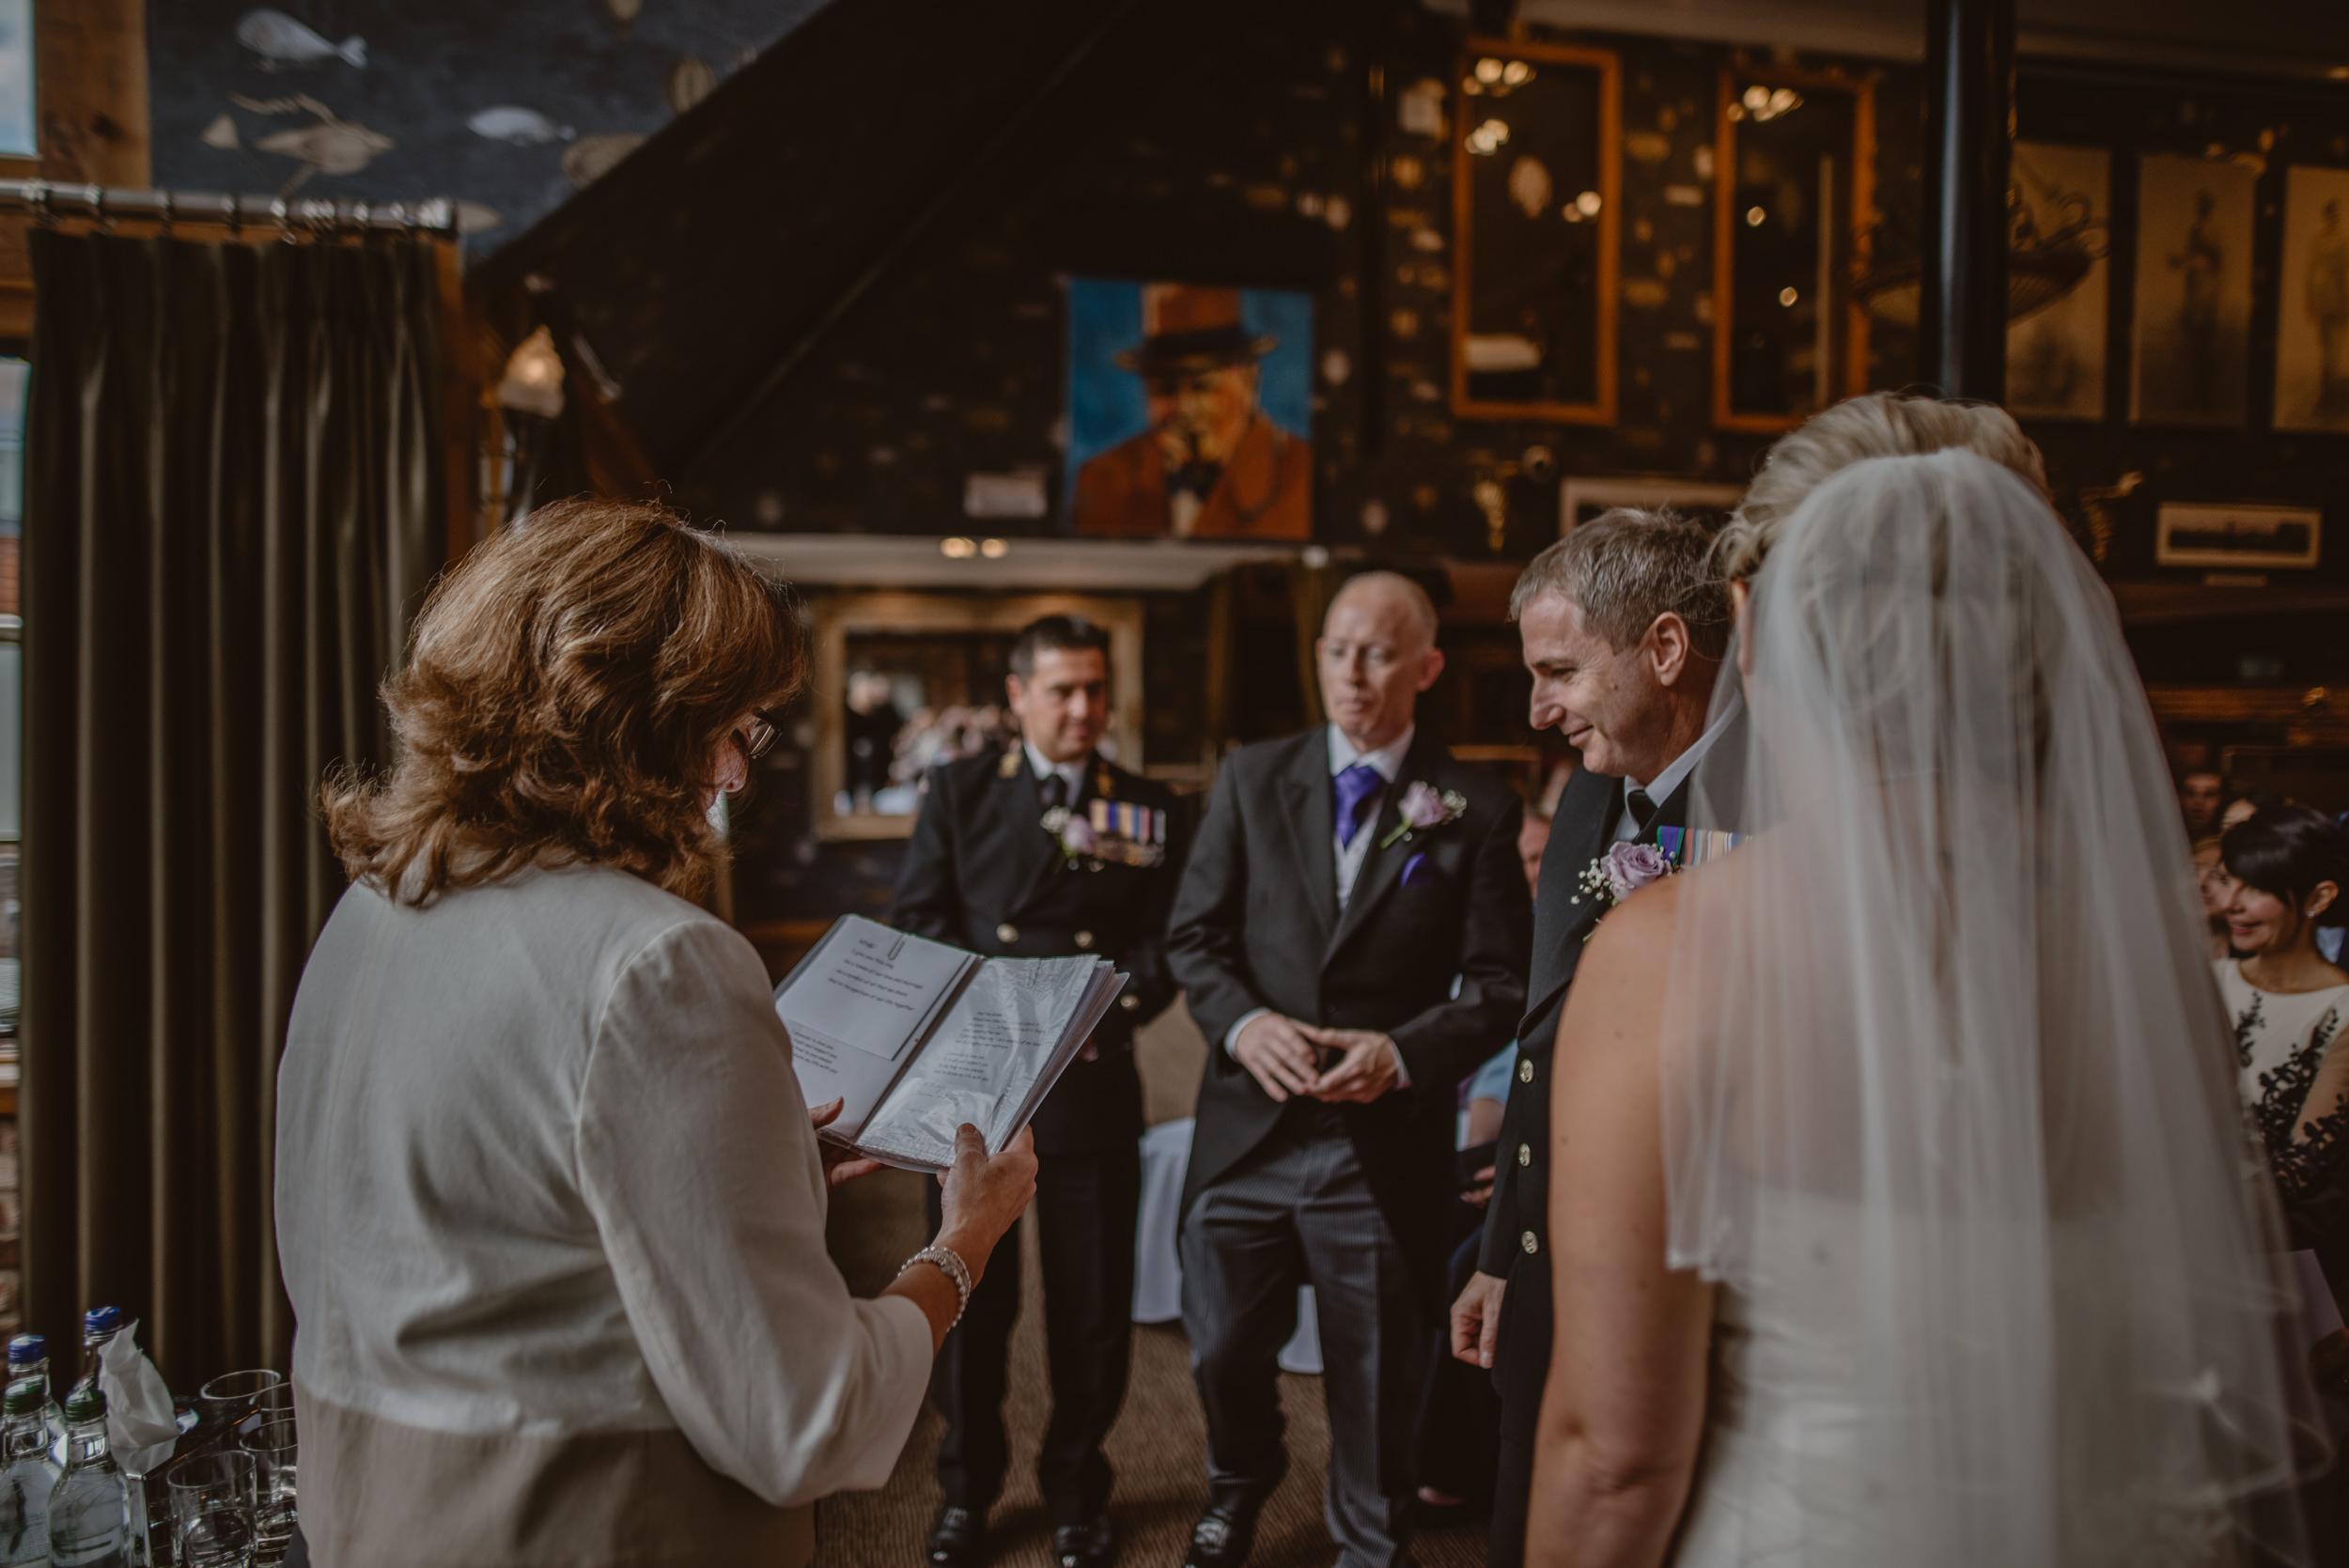 Chantelle-and-Stephen-Old-Thorns-Hotel-Wedding-Liphook-Manu-Mendoza-Wedding-Photography-216.jpg